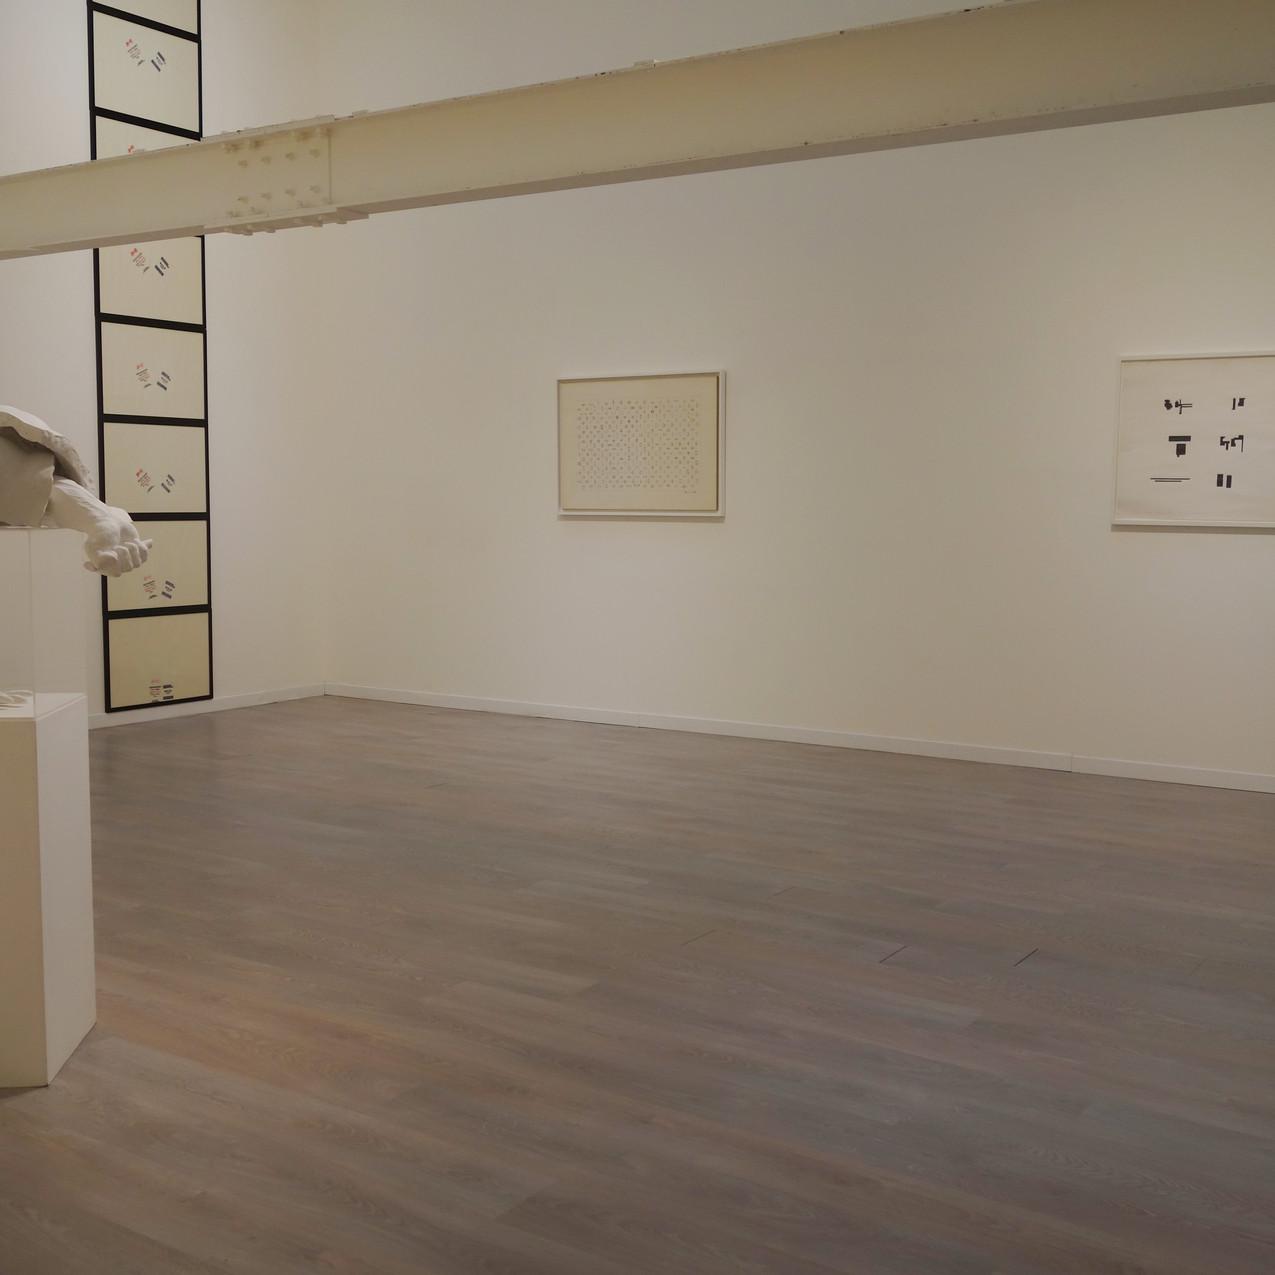 Cardi Gallery